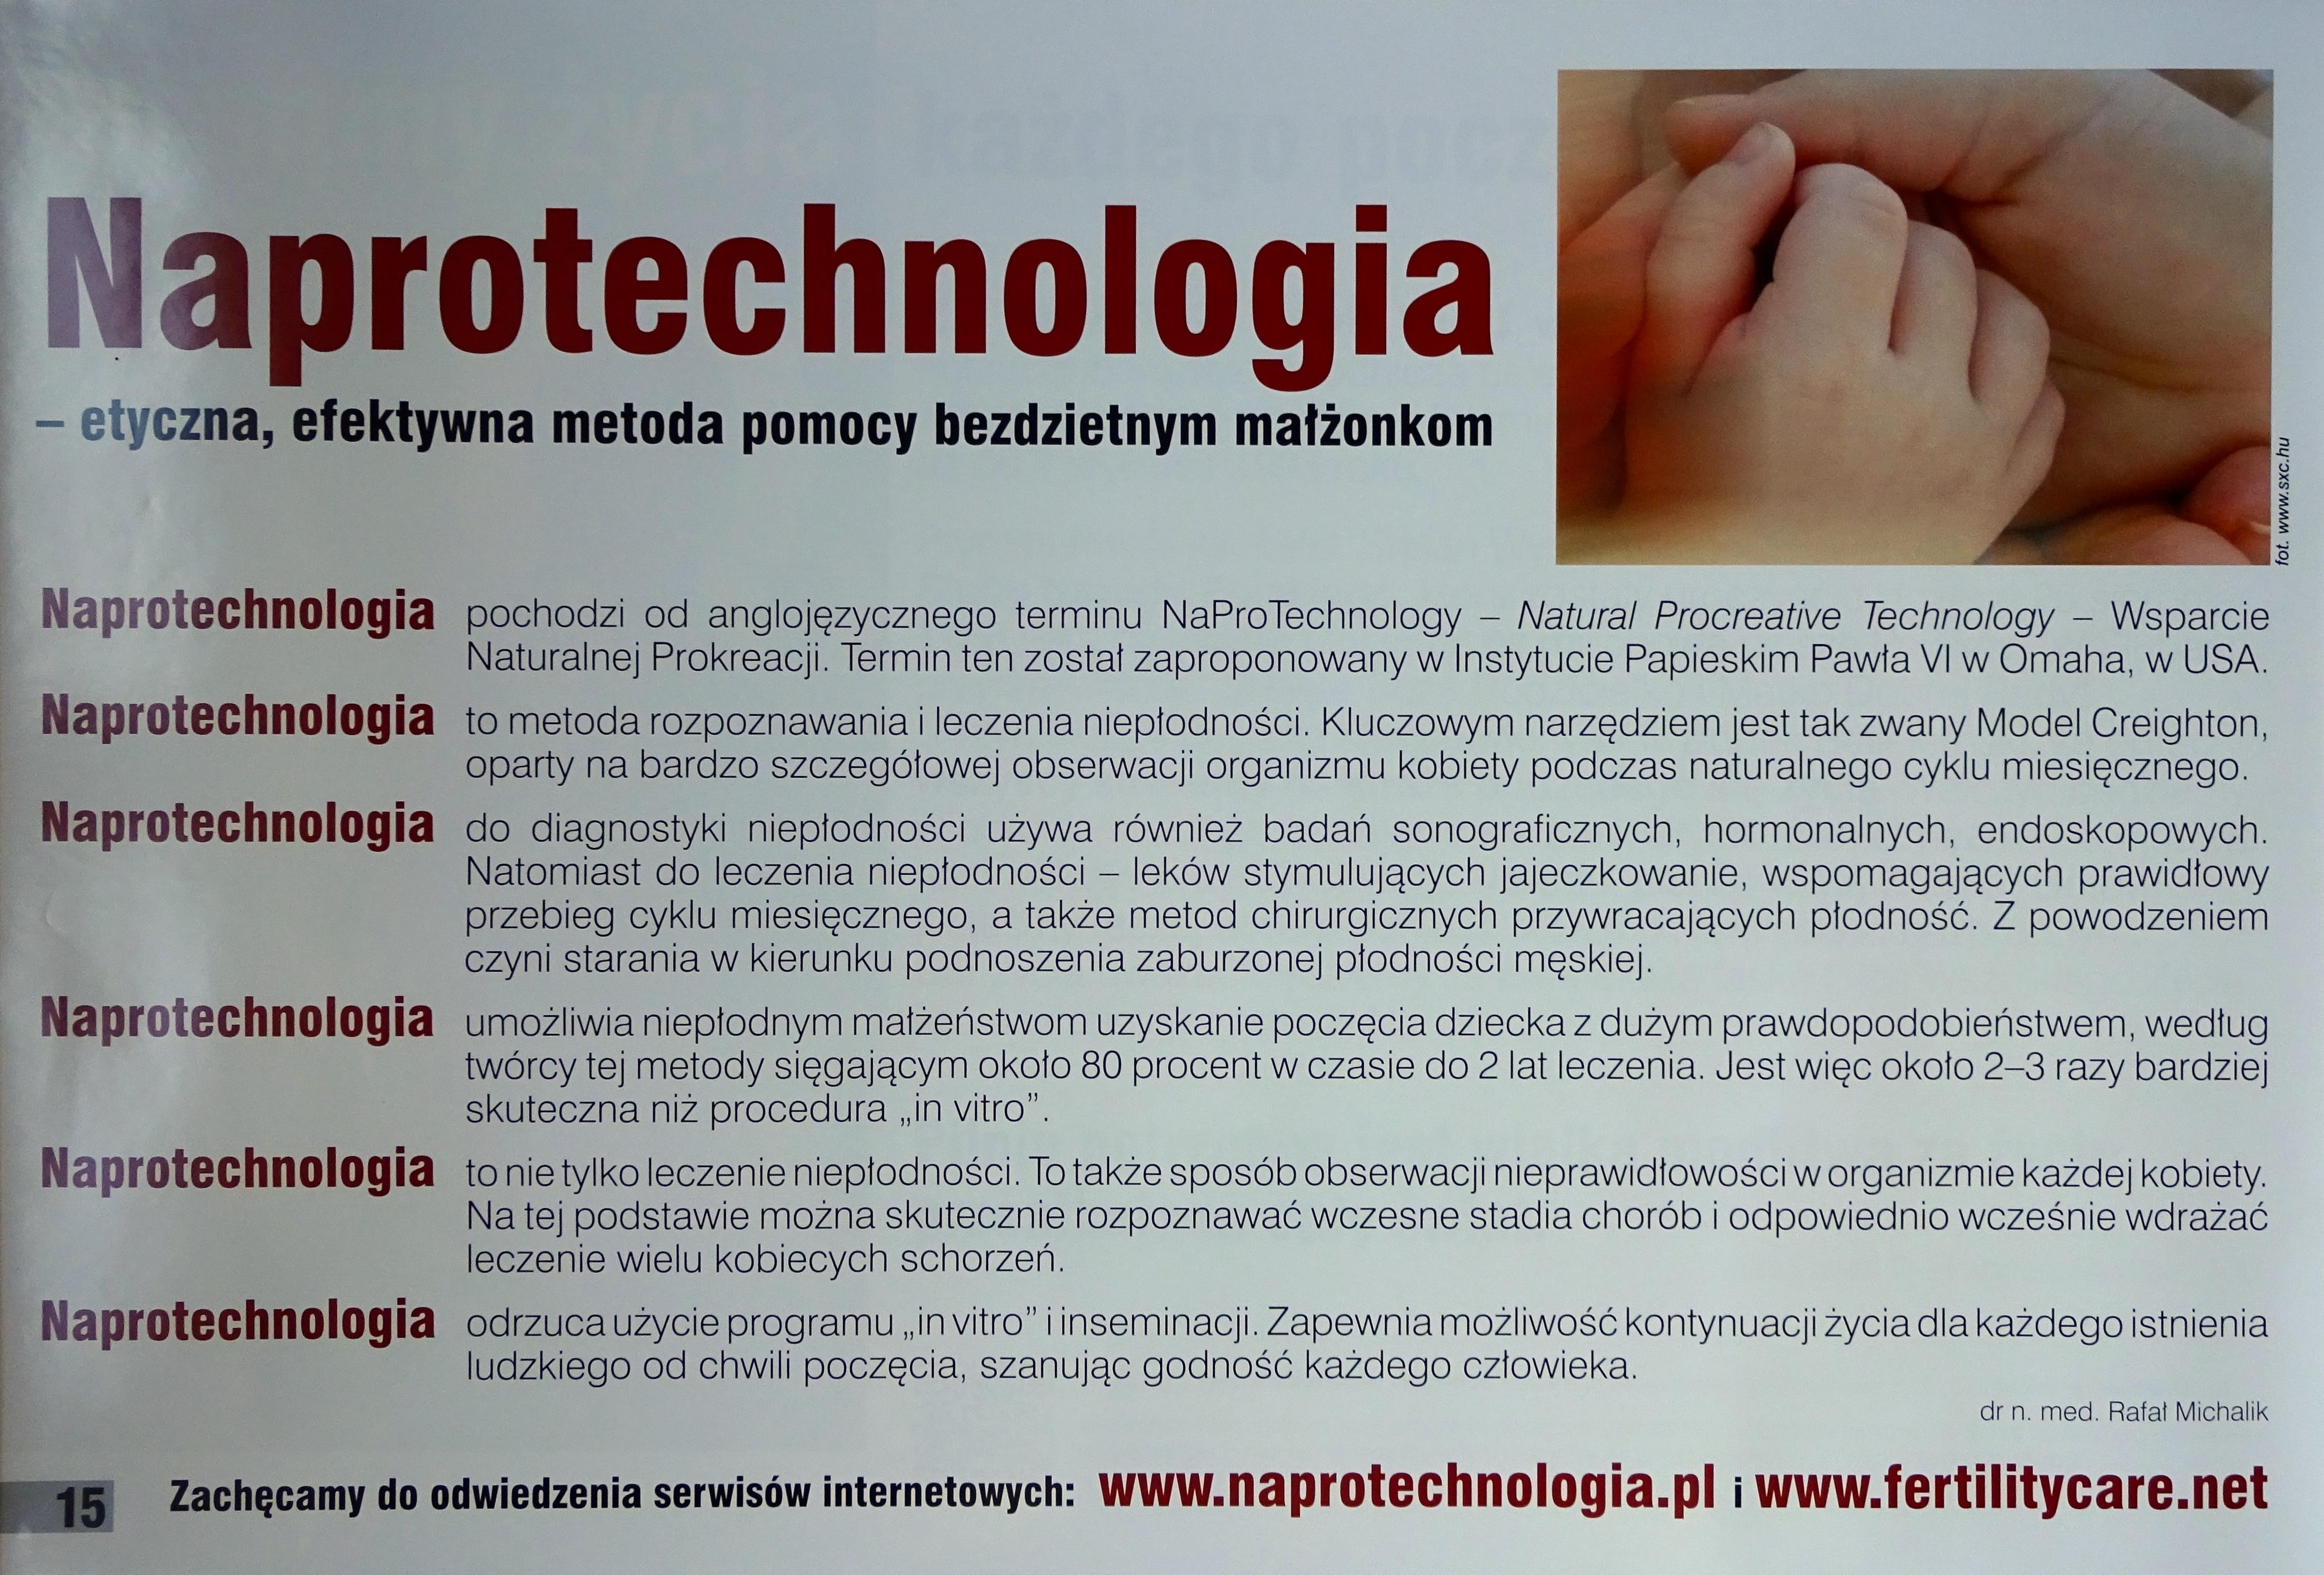 Naprotechnologia.